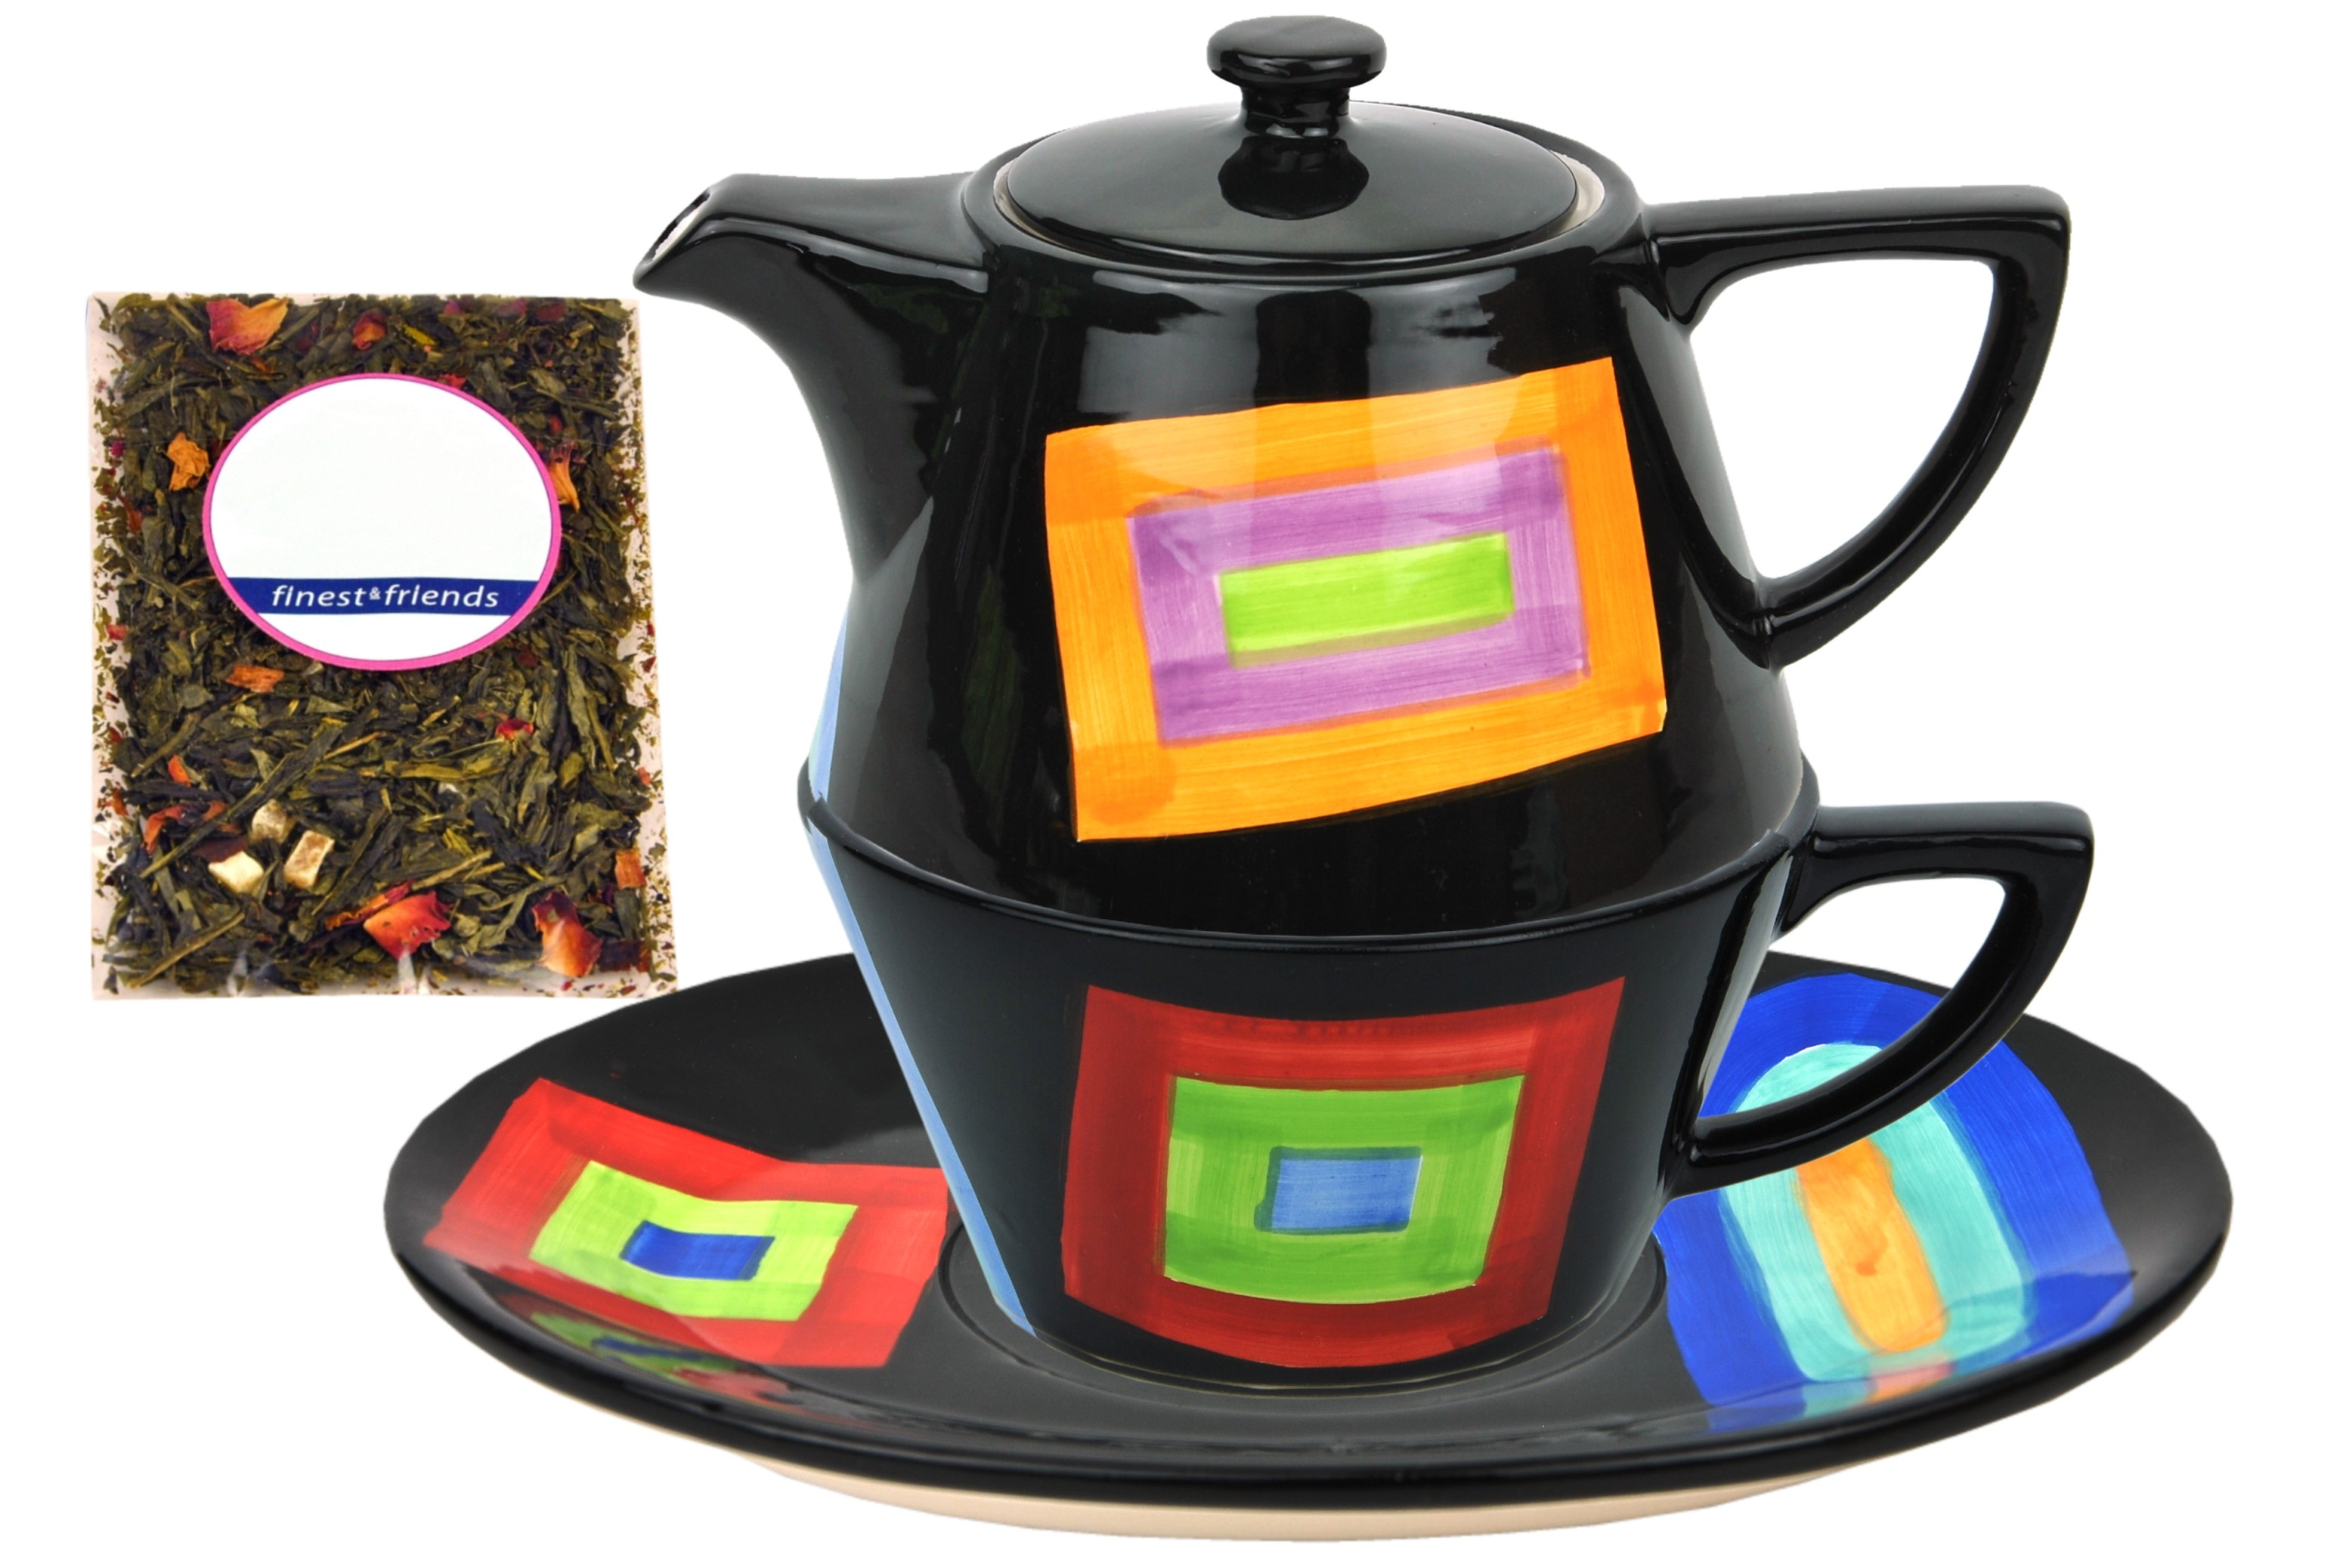 tea for one keramik dekor farbkaros jameson tailor 6049 teeprobe porzellan teekannen. Black Bedroom Furniture Sets. Home Design Ideas